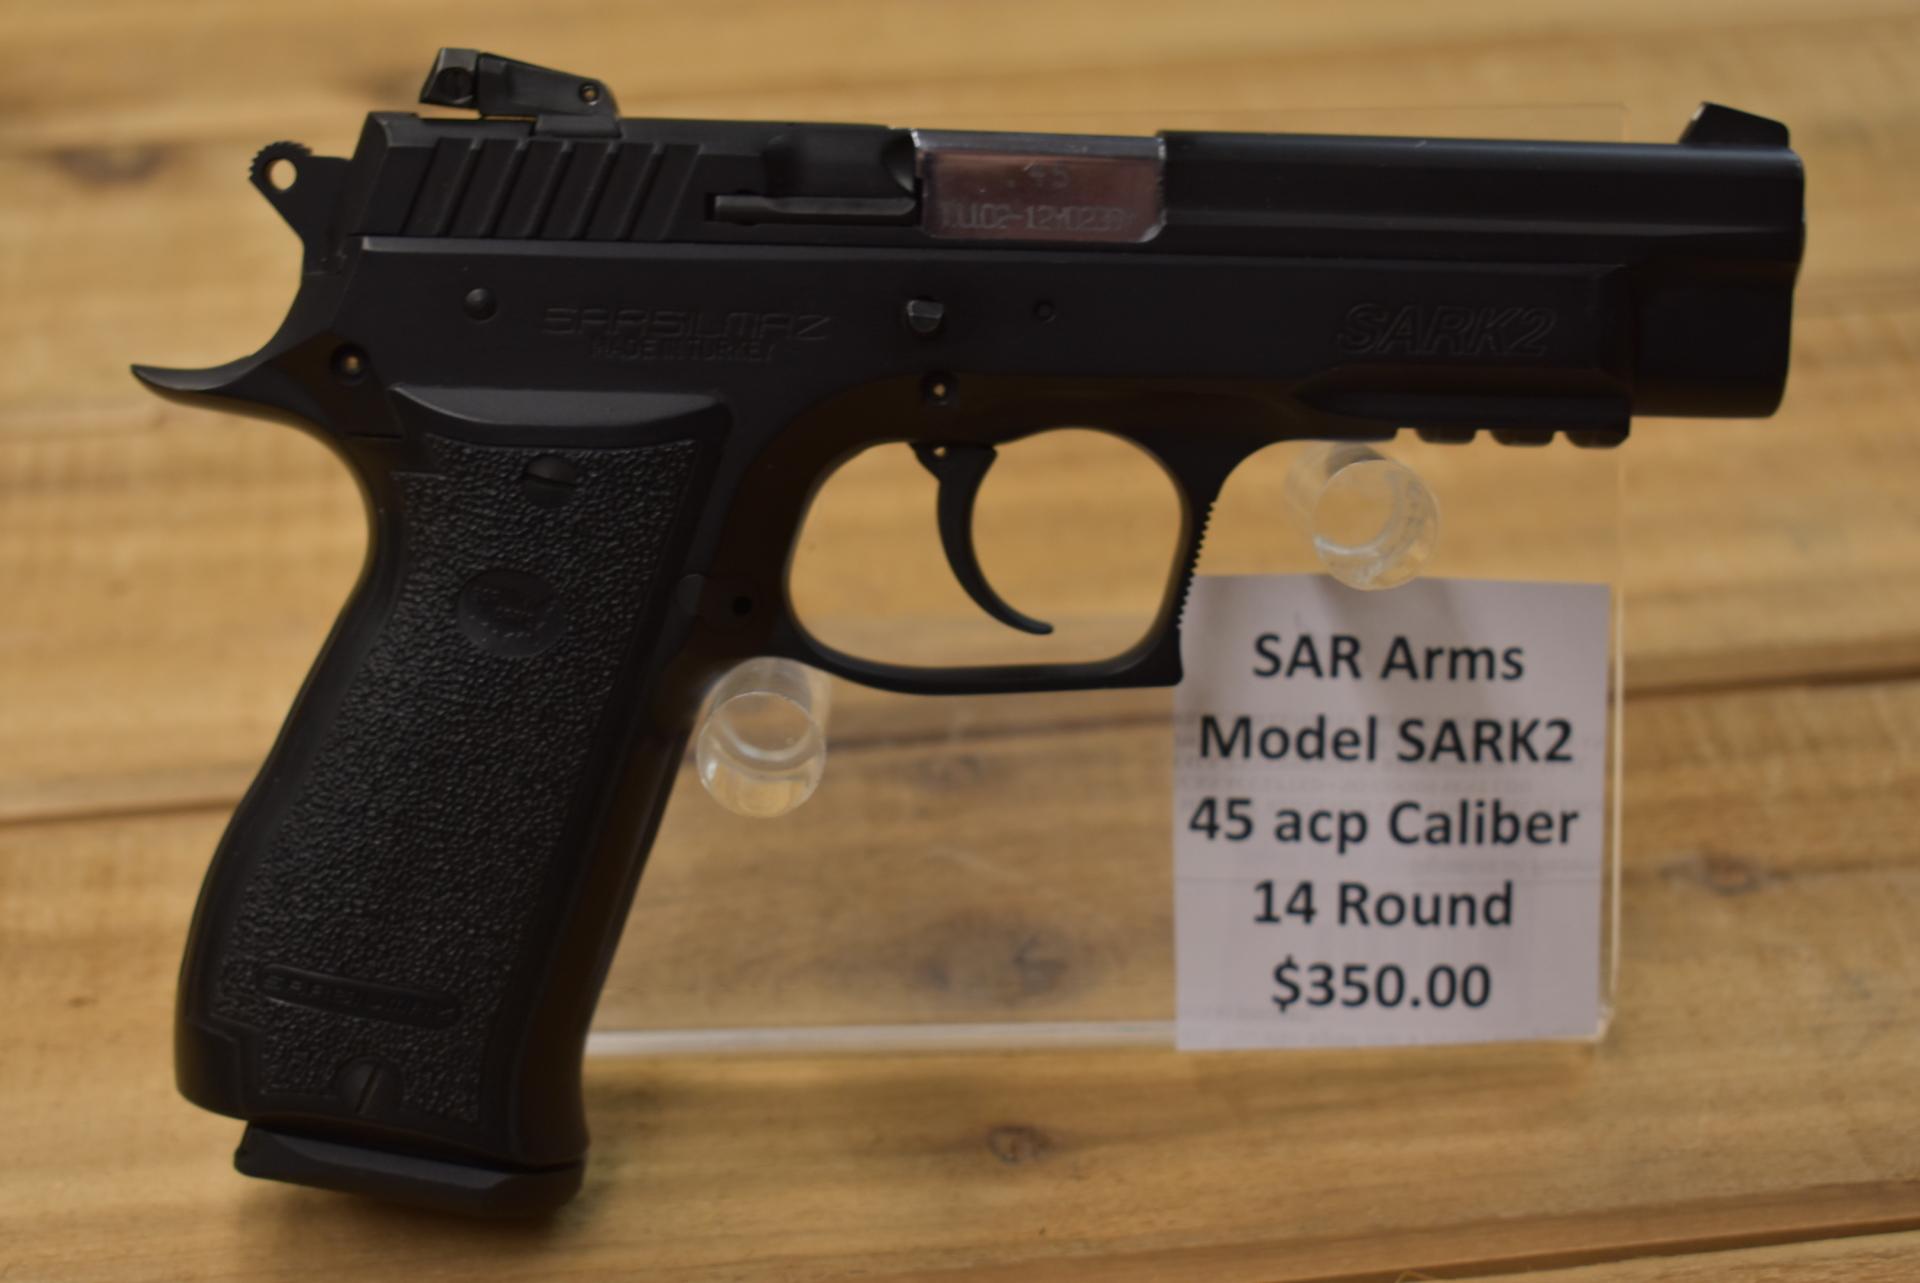 SAR Arms 45 acp